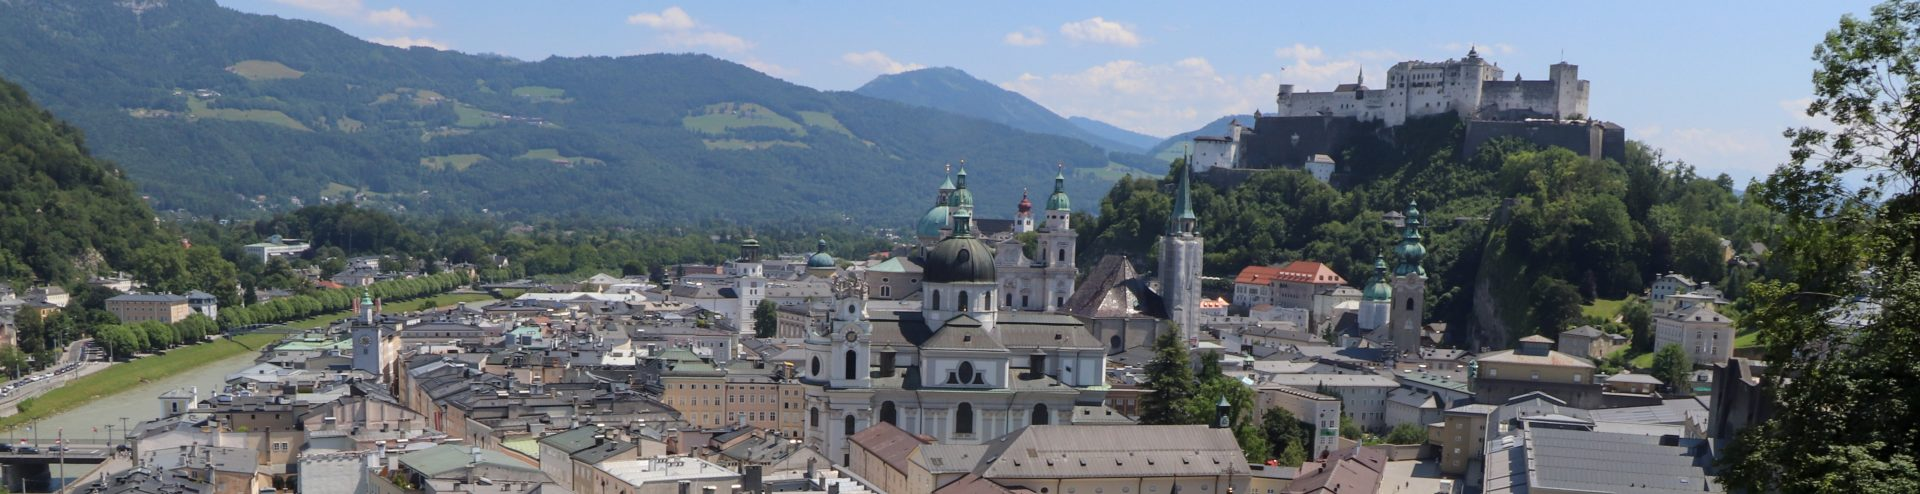 Top 10 Salzburgo (Áustria)